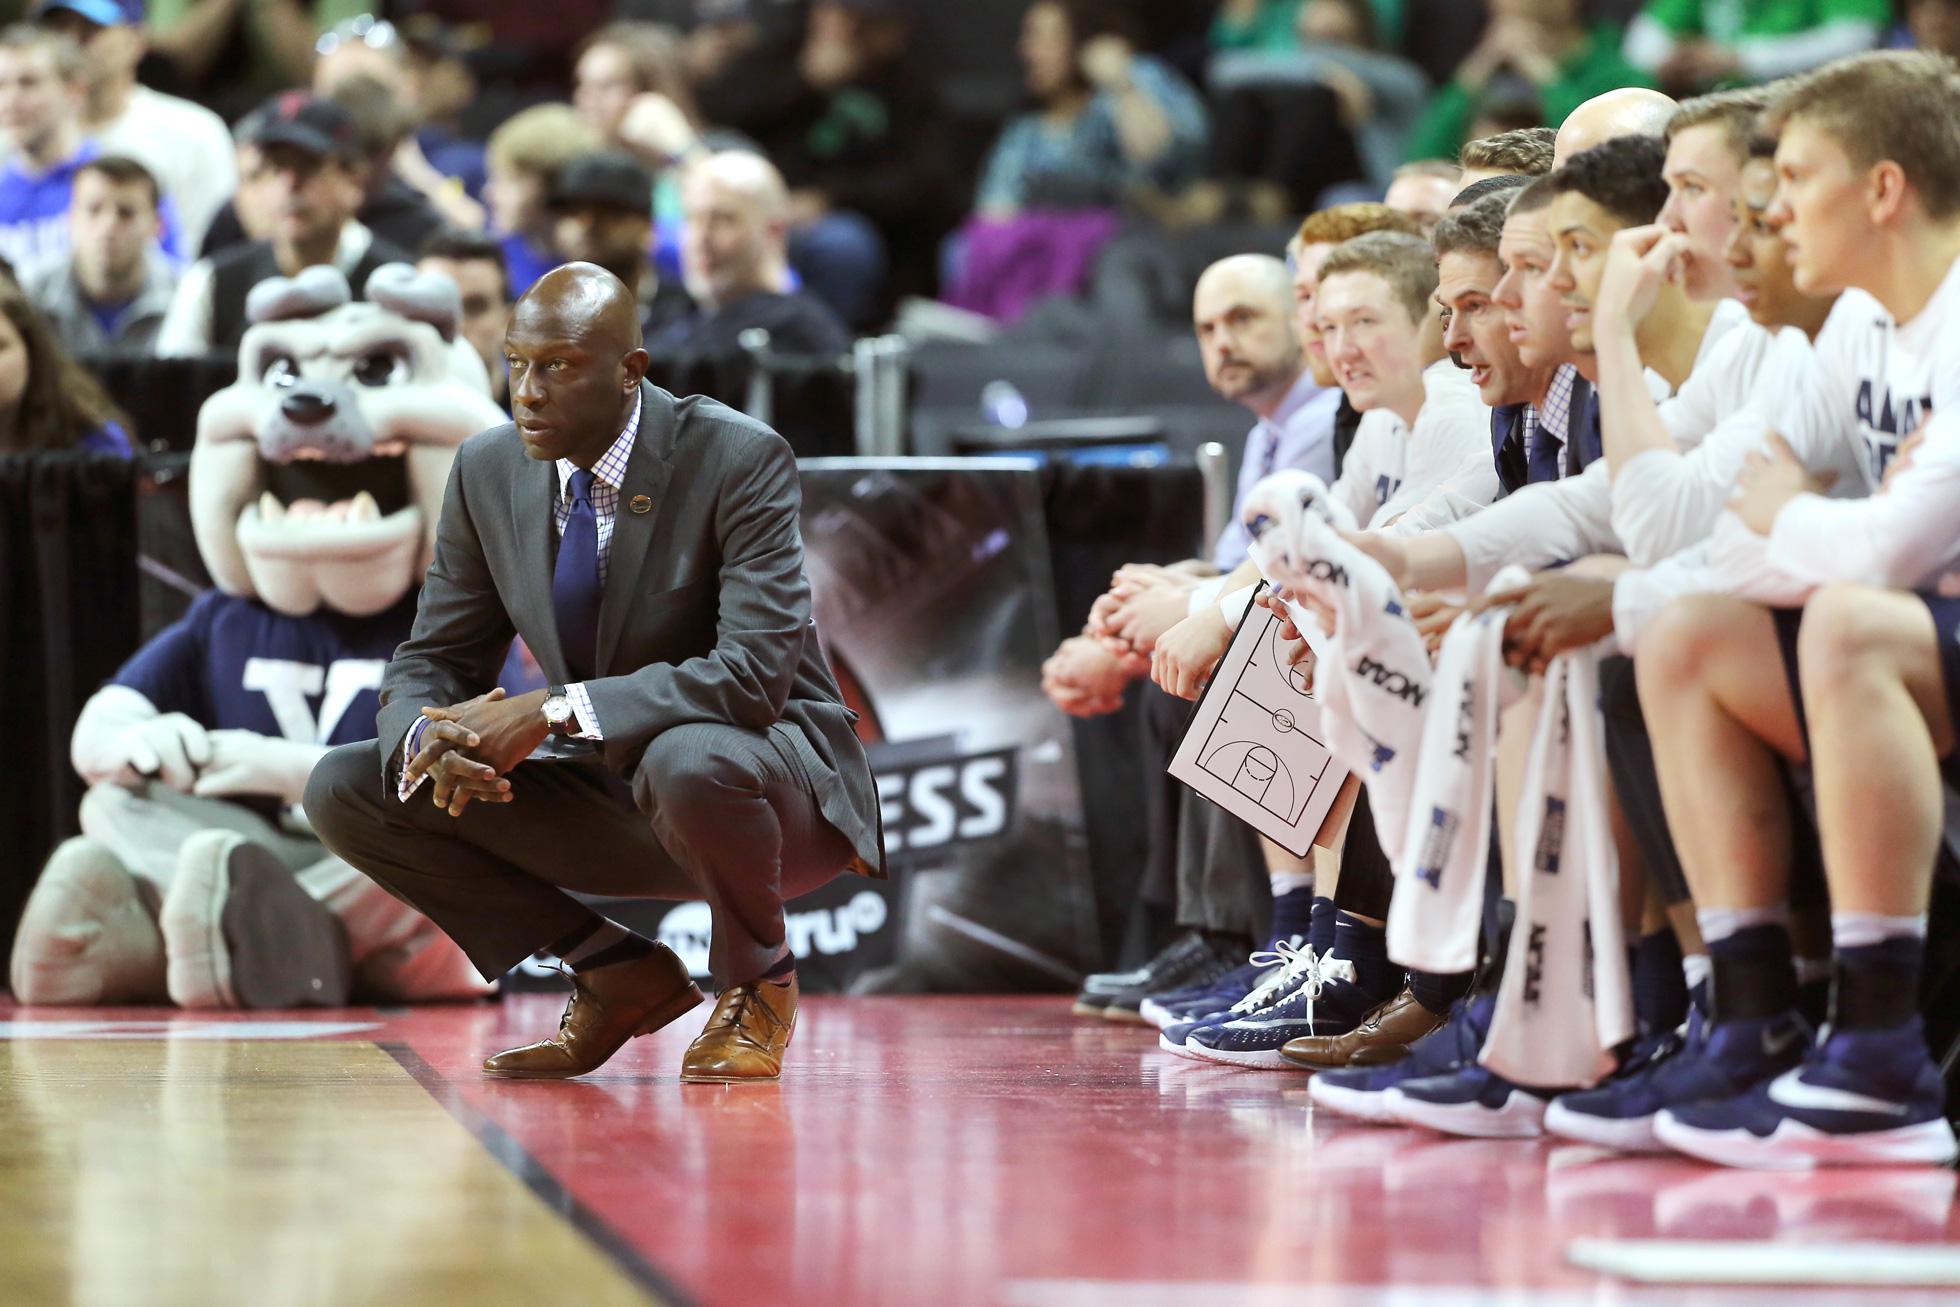 yale-mens-basketball-coach-james-jones-camp-a .jpg